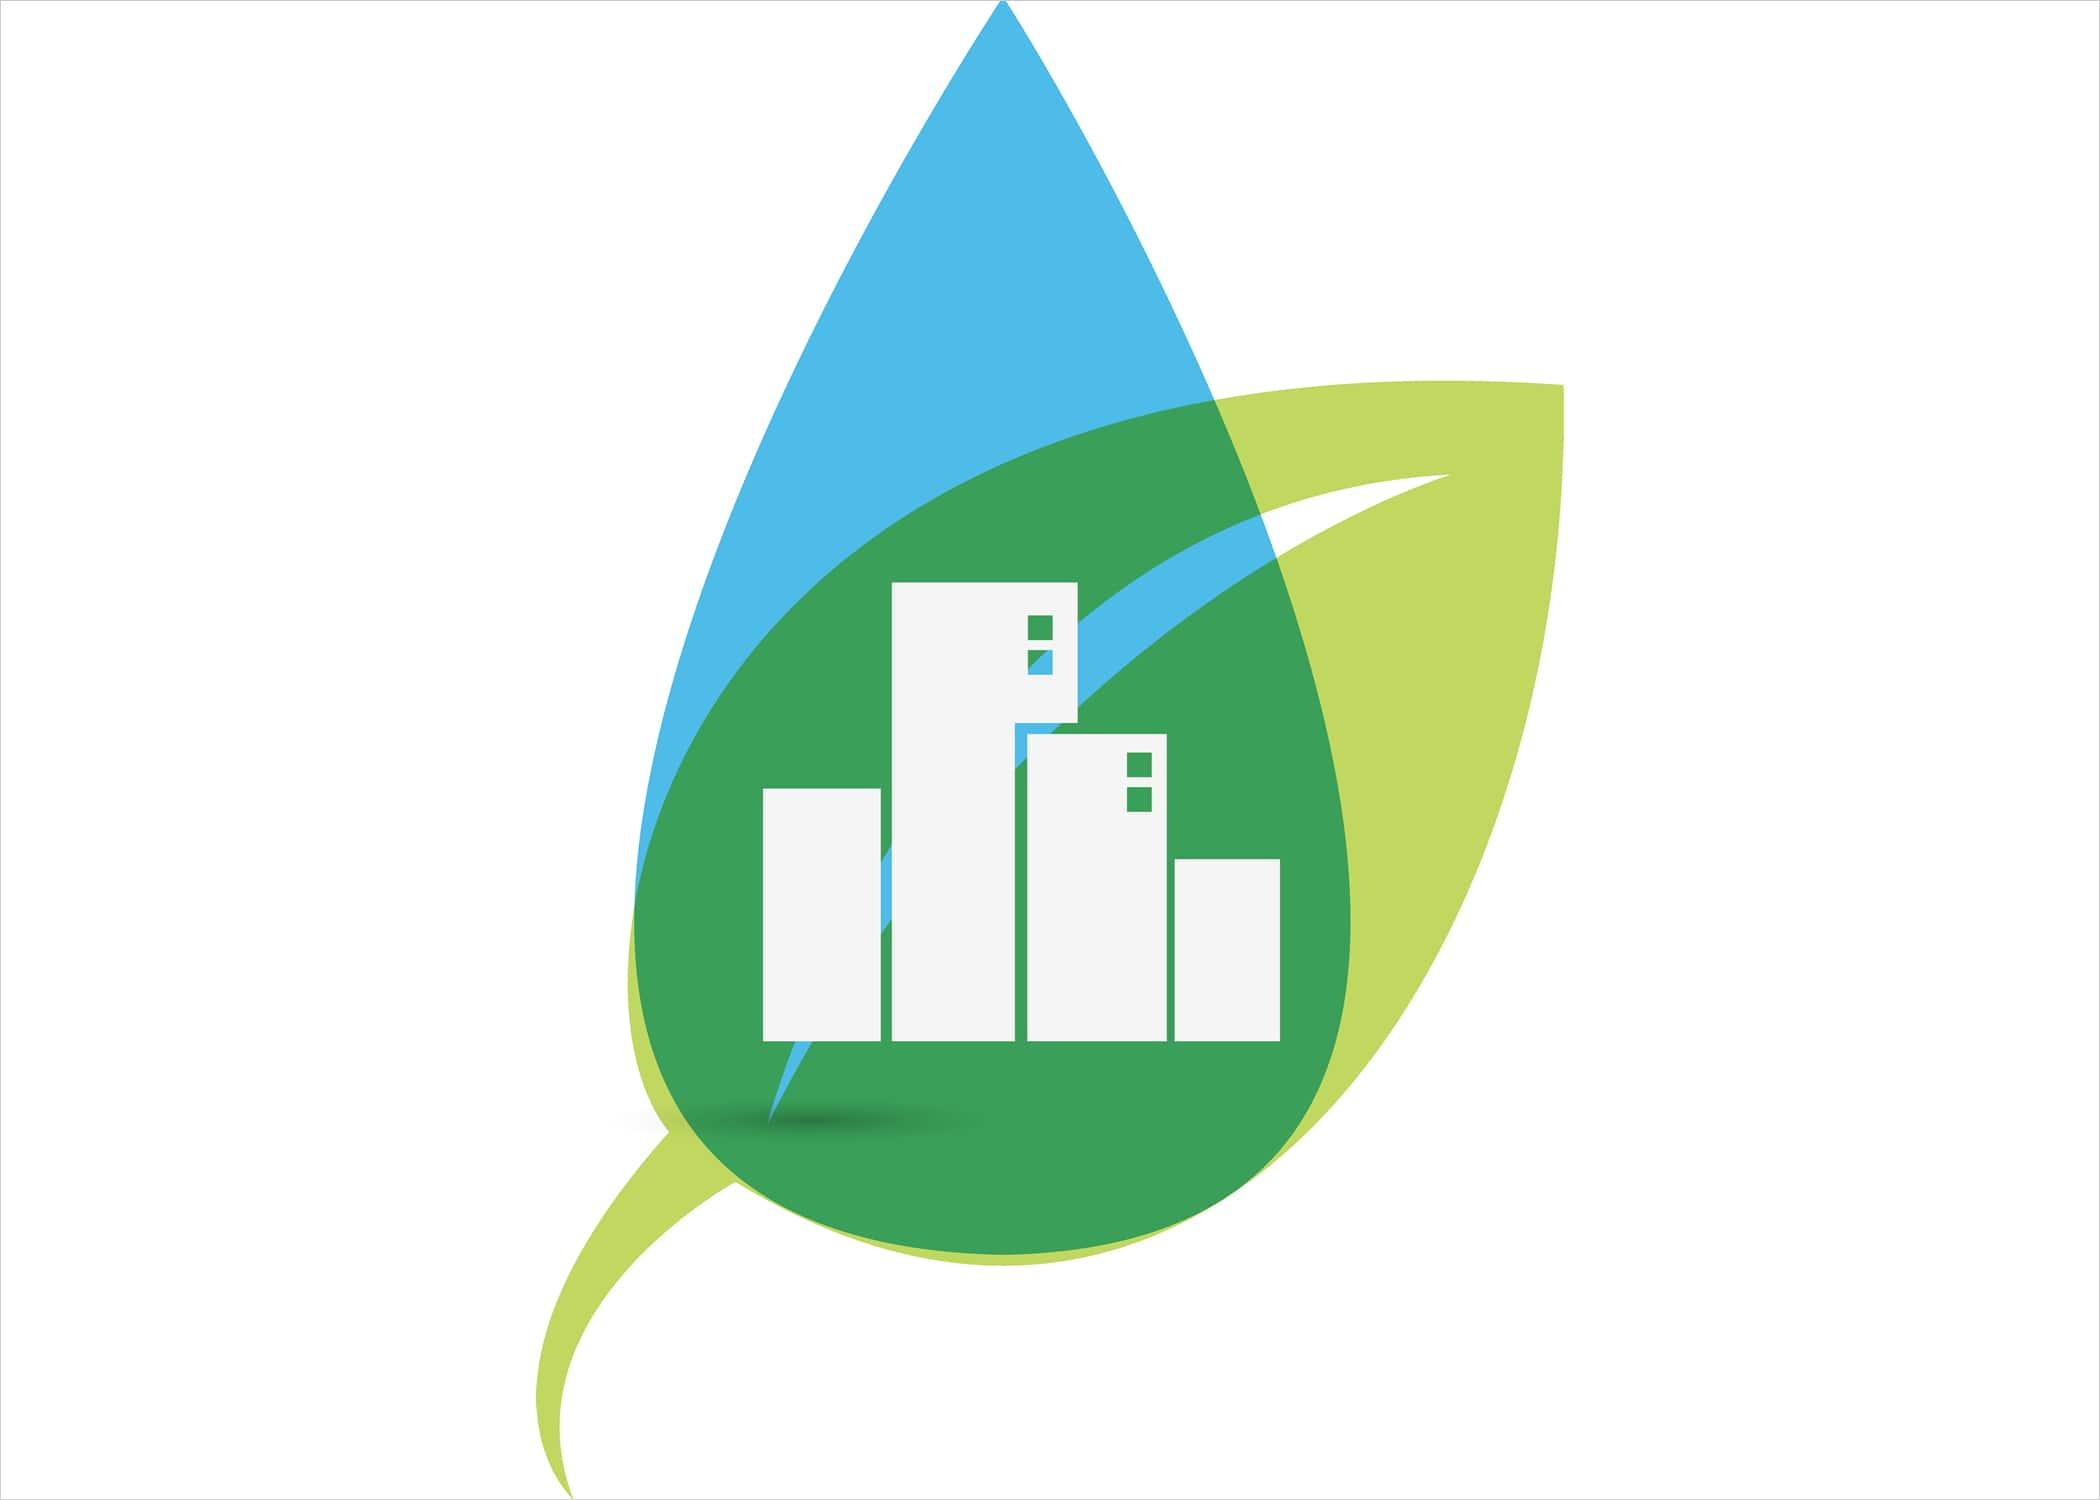 naem-webinar-2016-environmental-remediation-sustainable-and-green-strategies-700x500